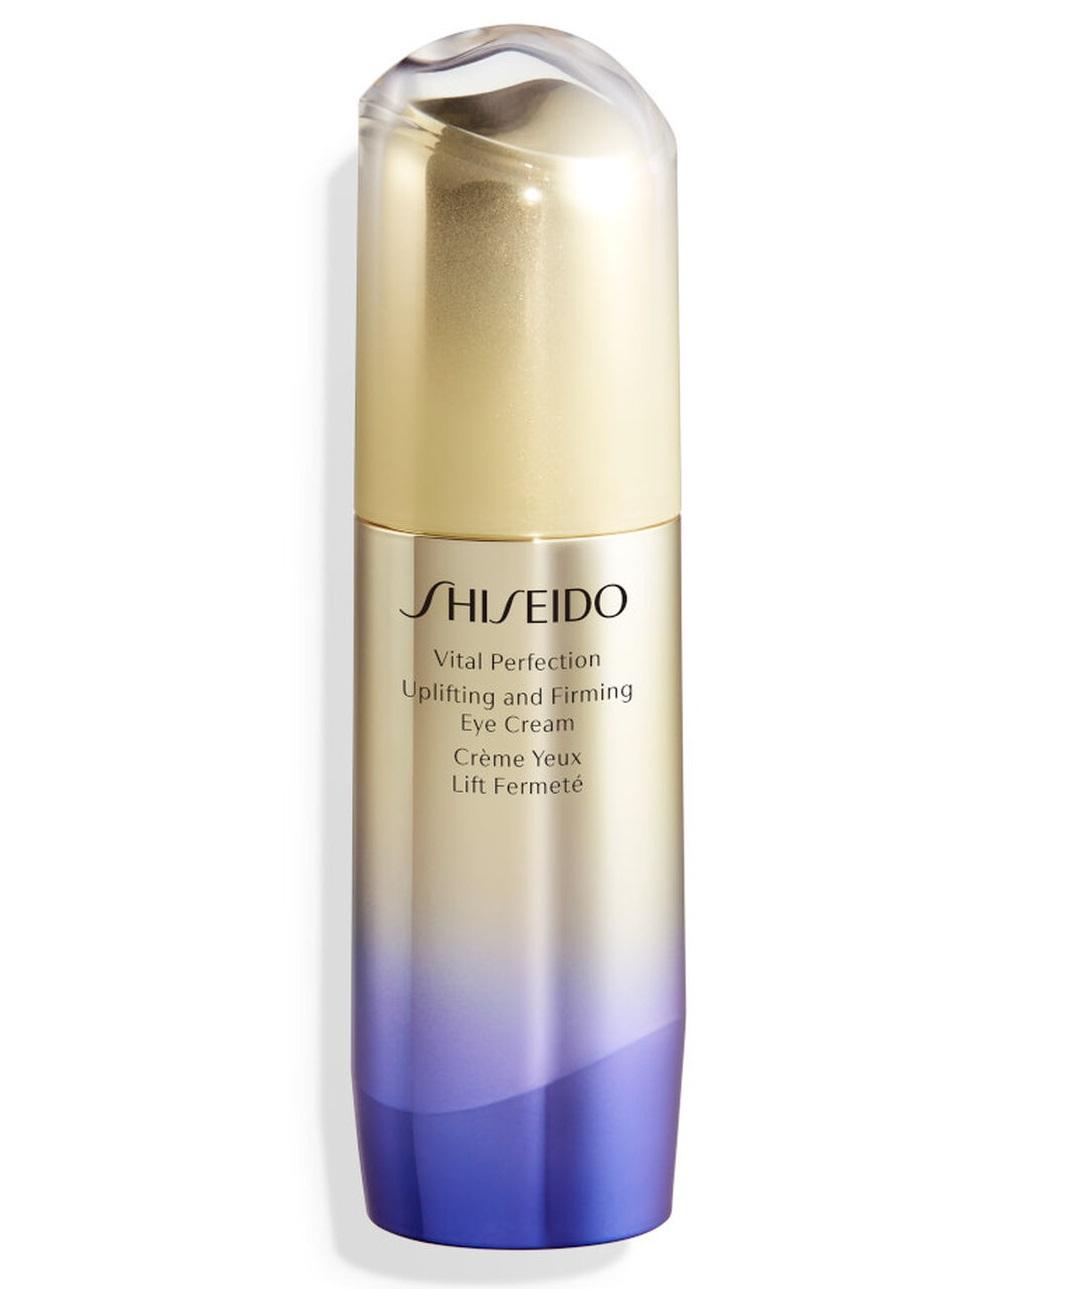 Shiseido Vital Perfection Uplifting and Firming Contorno de Ojos  15 ml